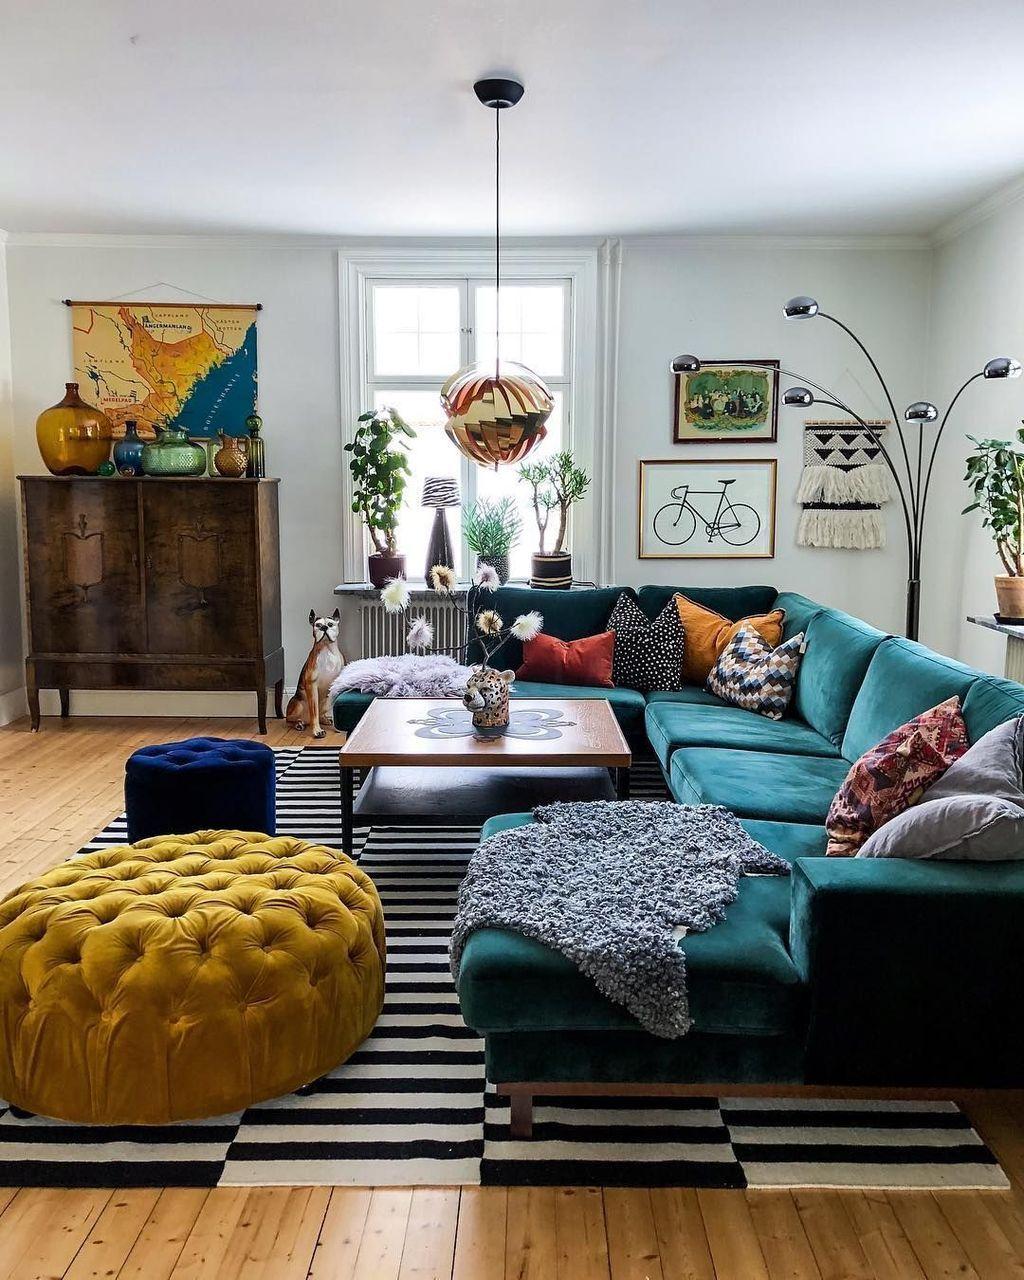 20 Impressive Salon Room Design Ideas Trenduhome Eclectic Living Room Colorful Eclectic Living Room Interior Design Living Room Warm